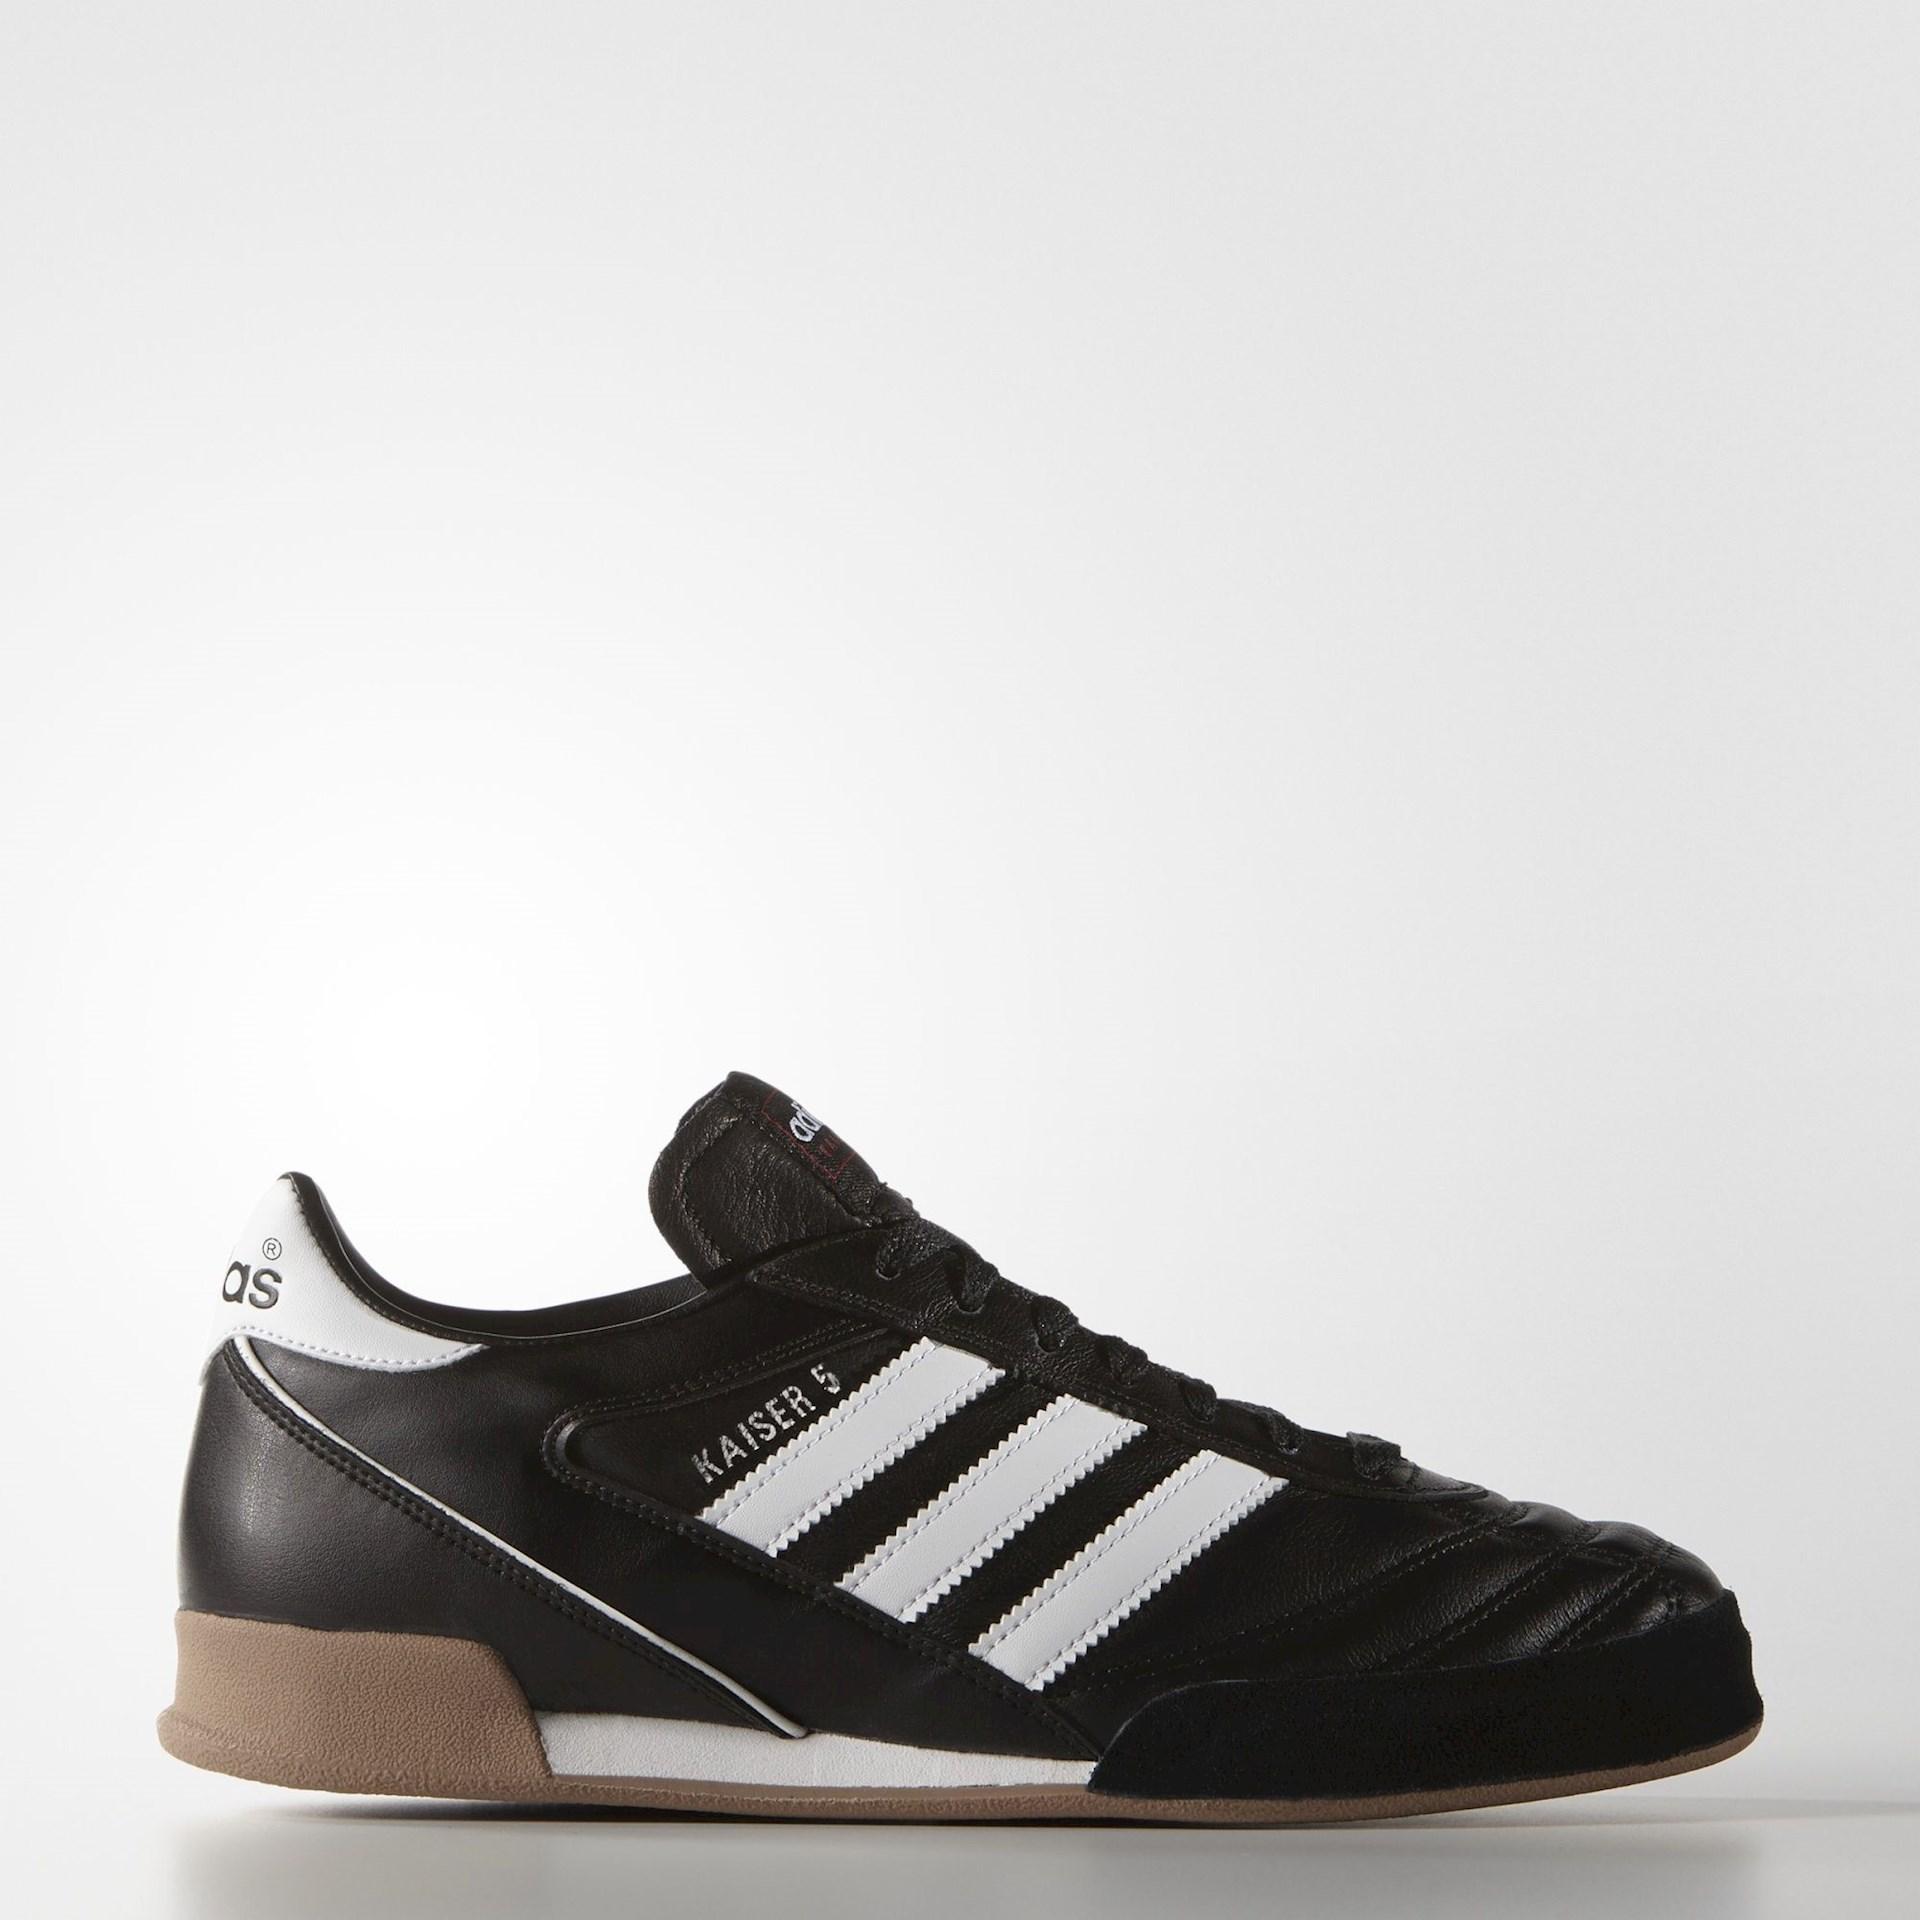 voetbalschoenen adidas schroefnop